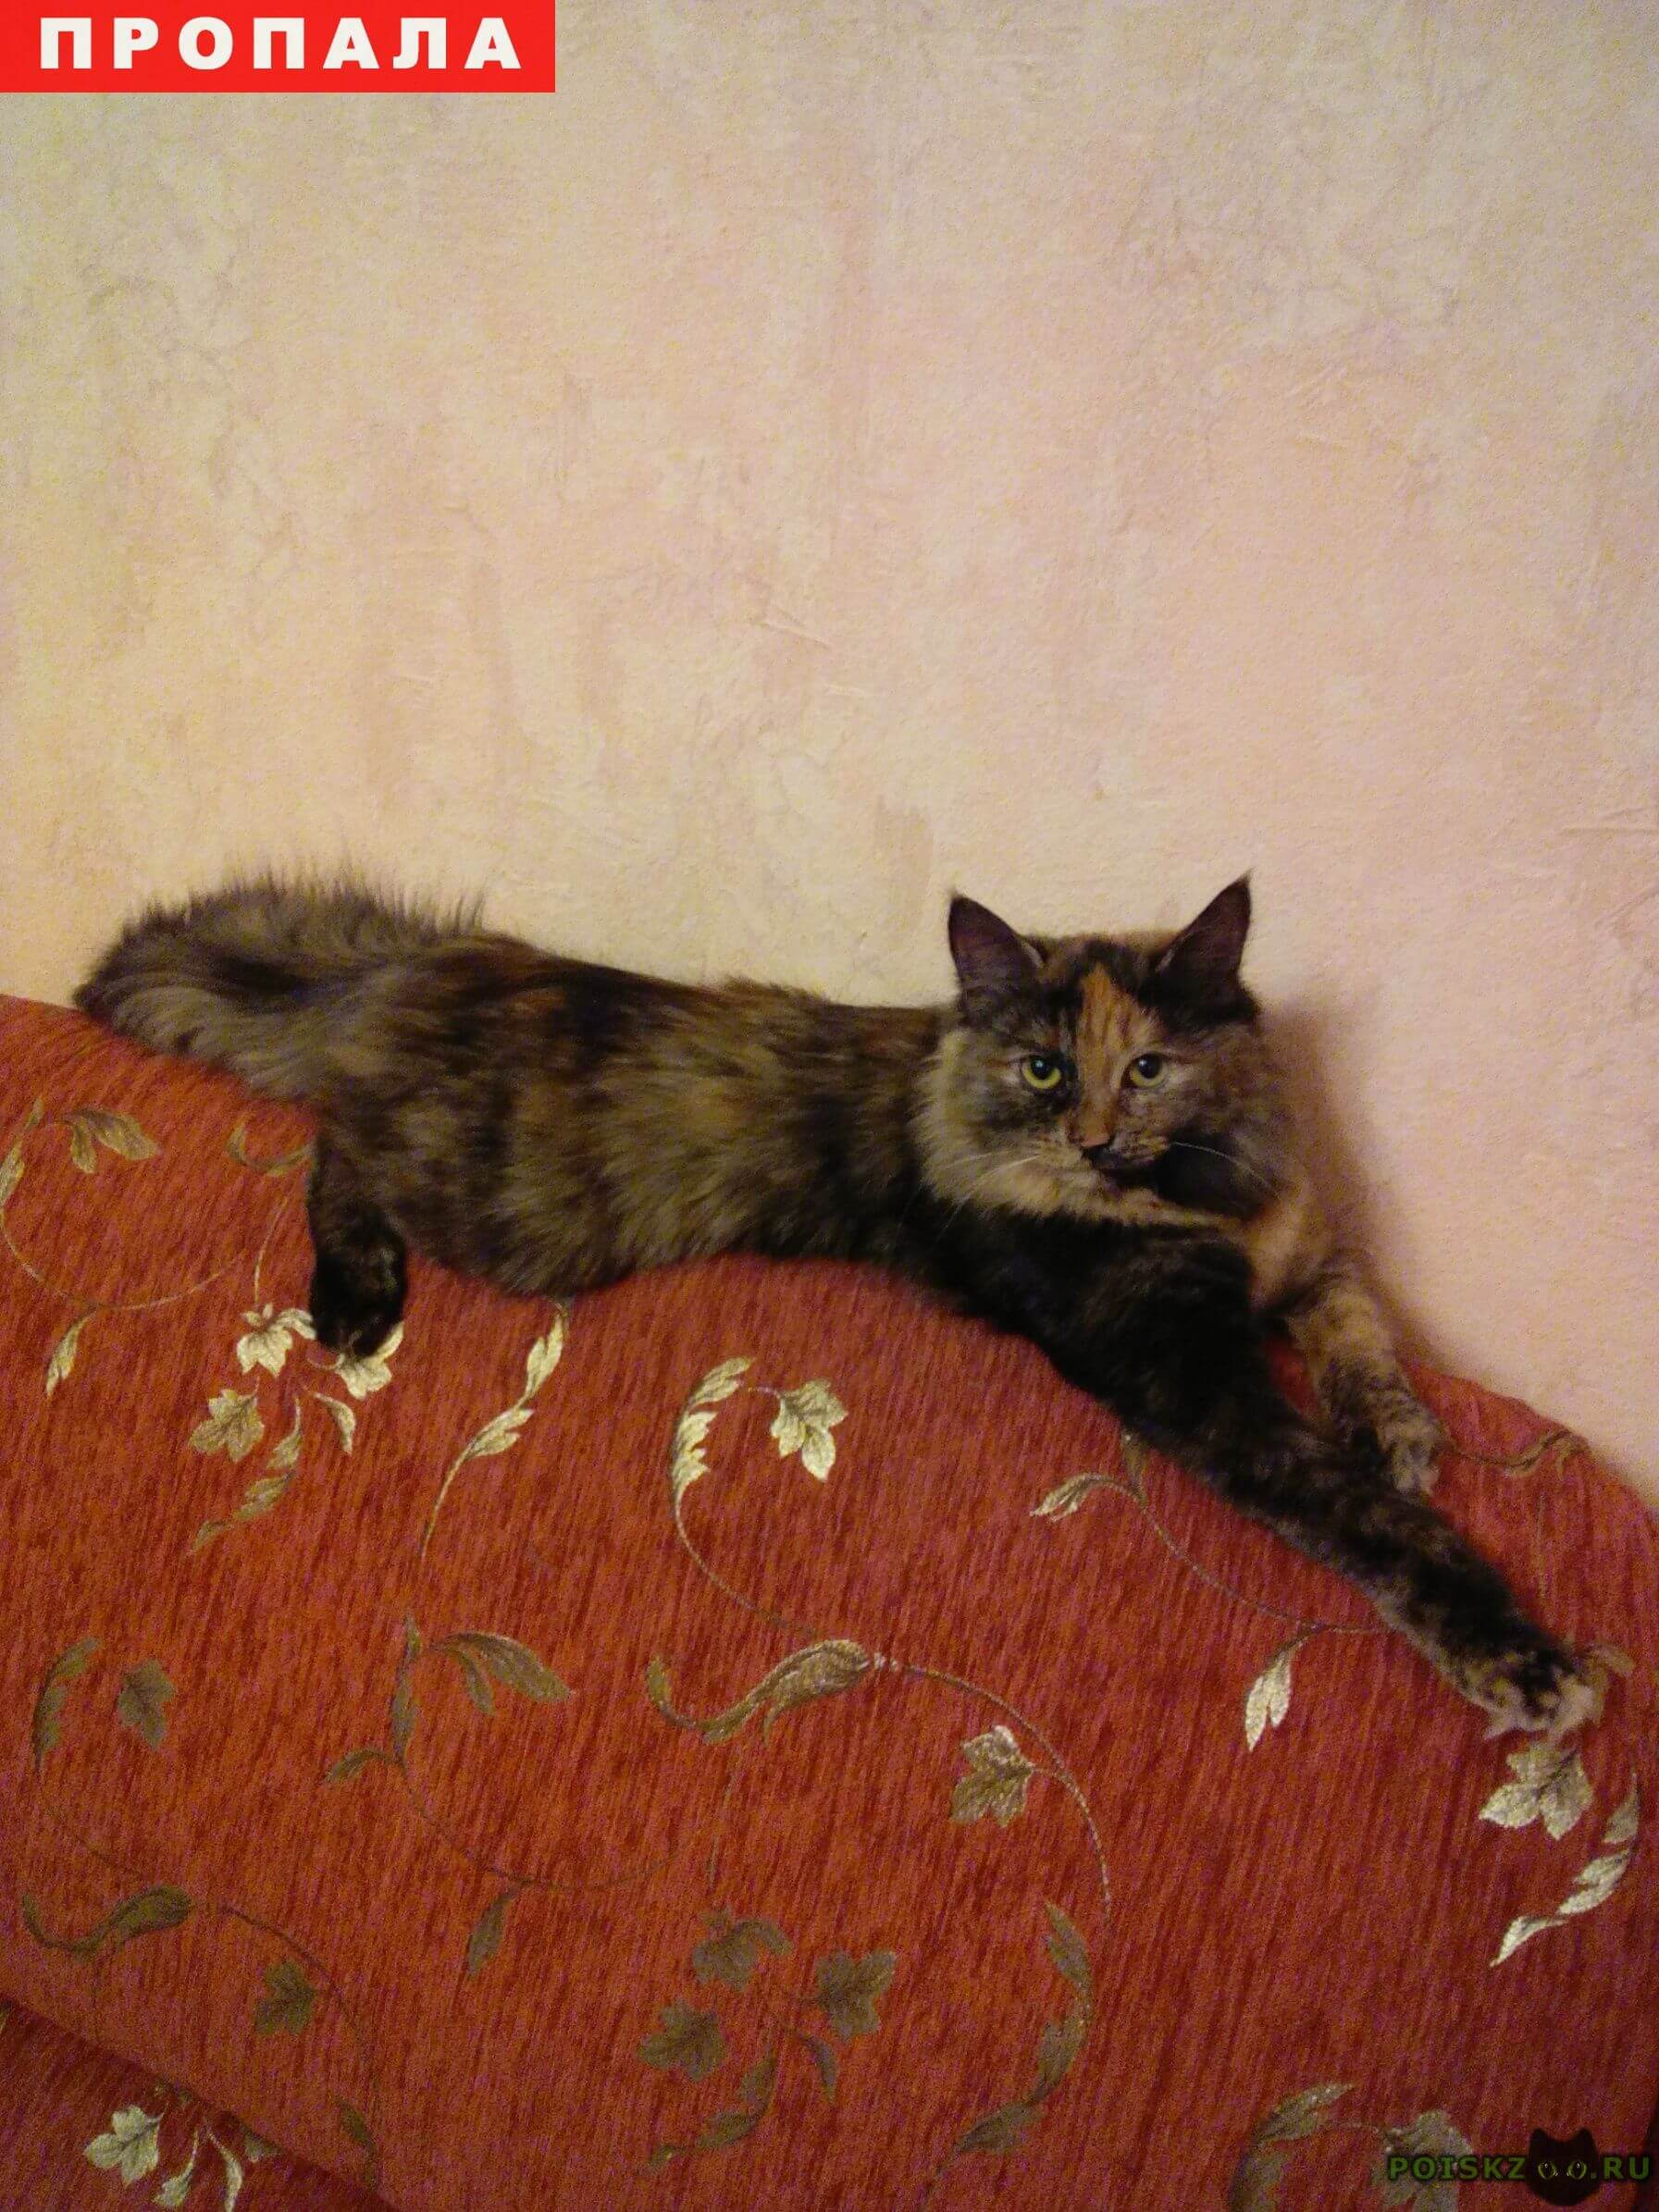 Пропала кошка люся г.Балашиха